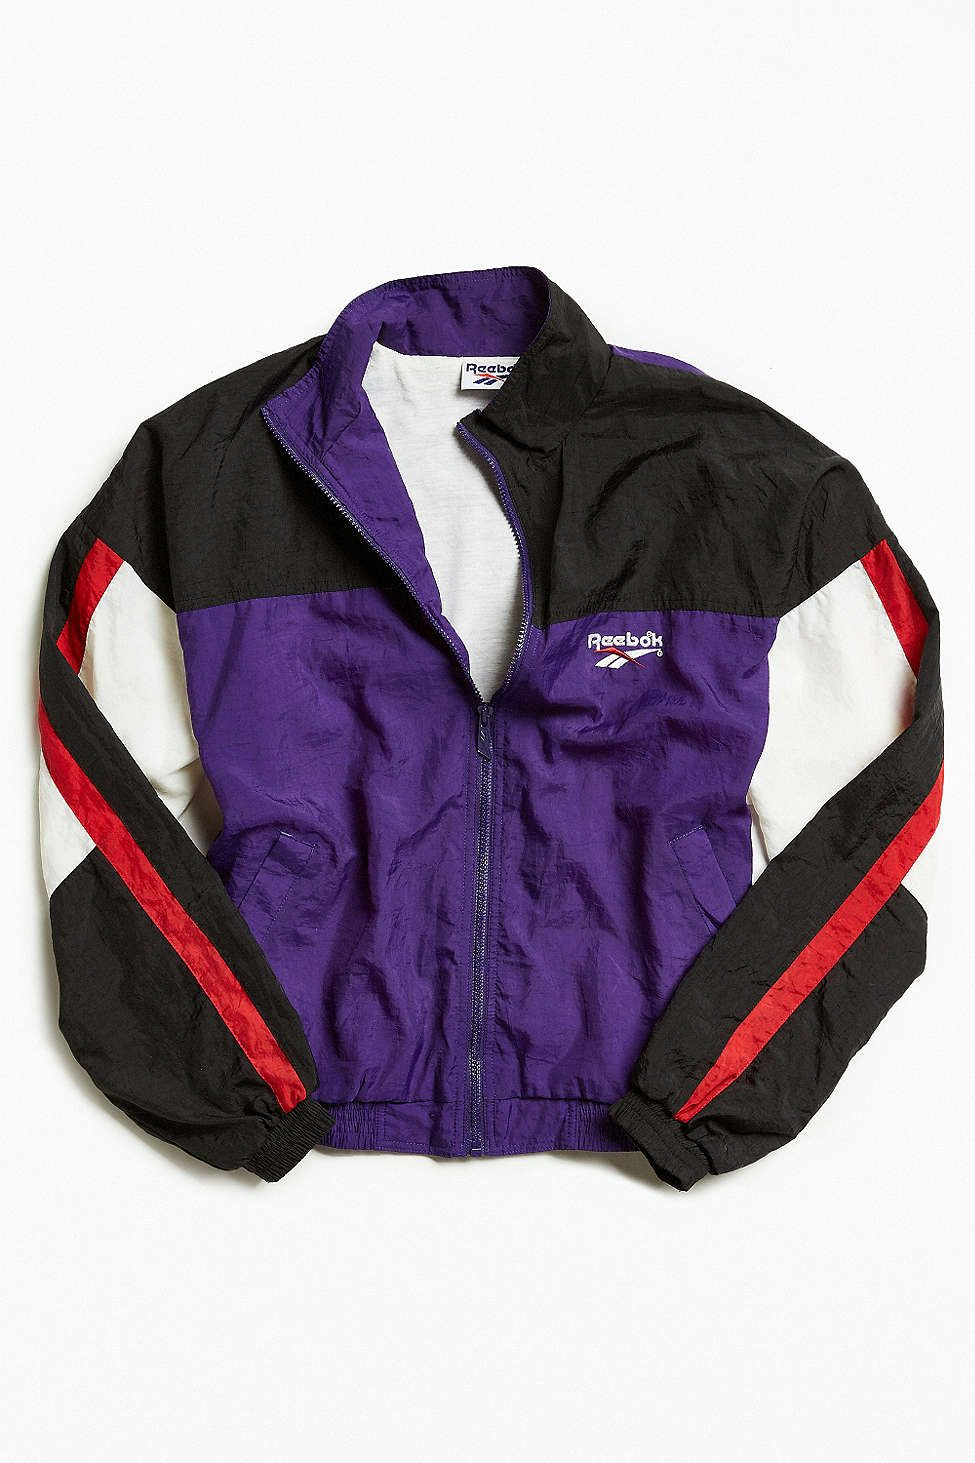 Vintage Reebok Windbreaker Jacket Urban Outfitters Windbreaker Jacket Vintage Reebok Jackets [ 1463 x 975 Pixel ]